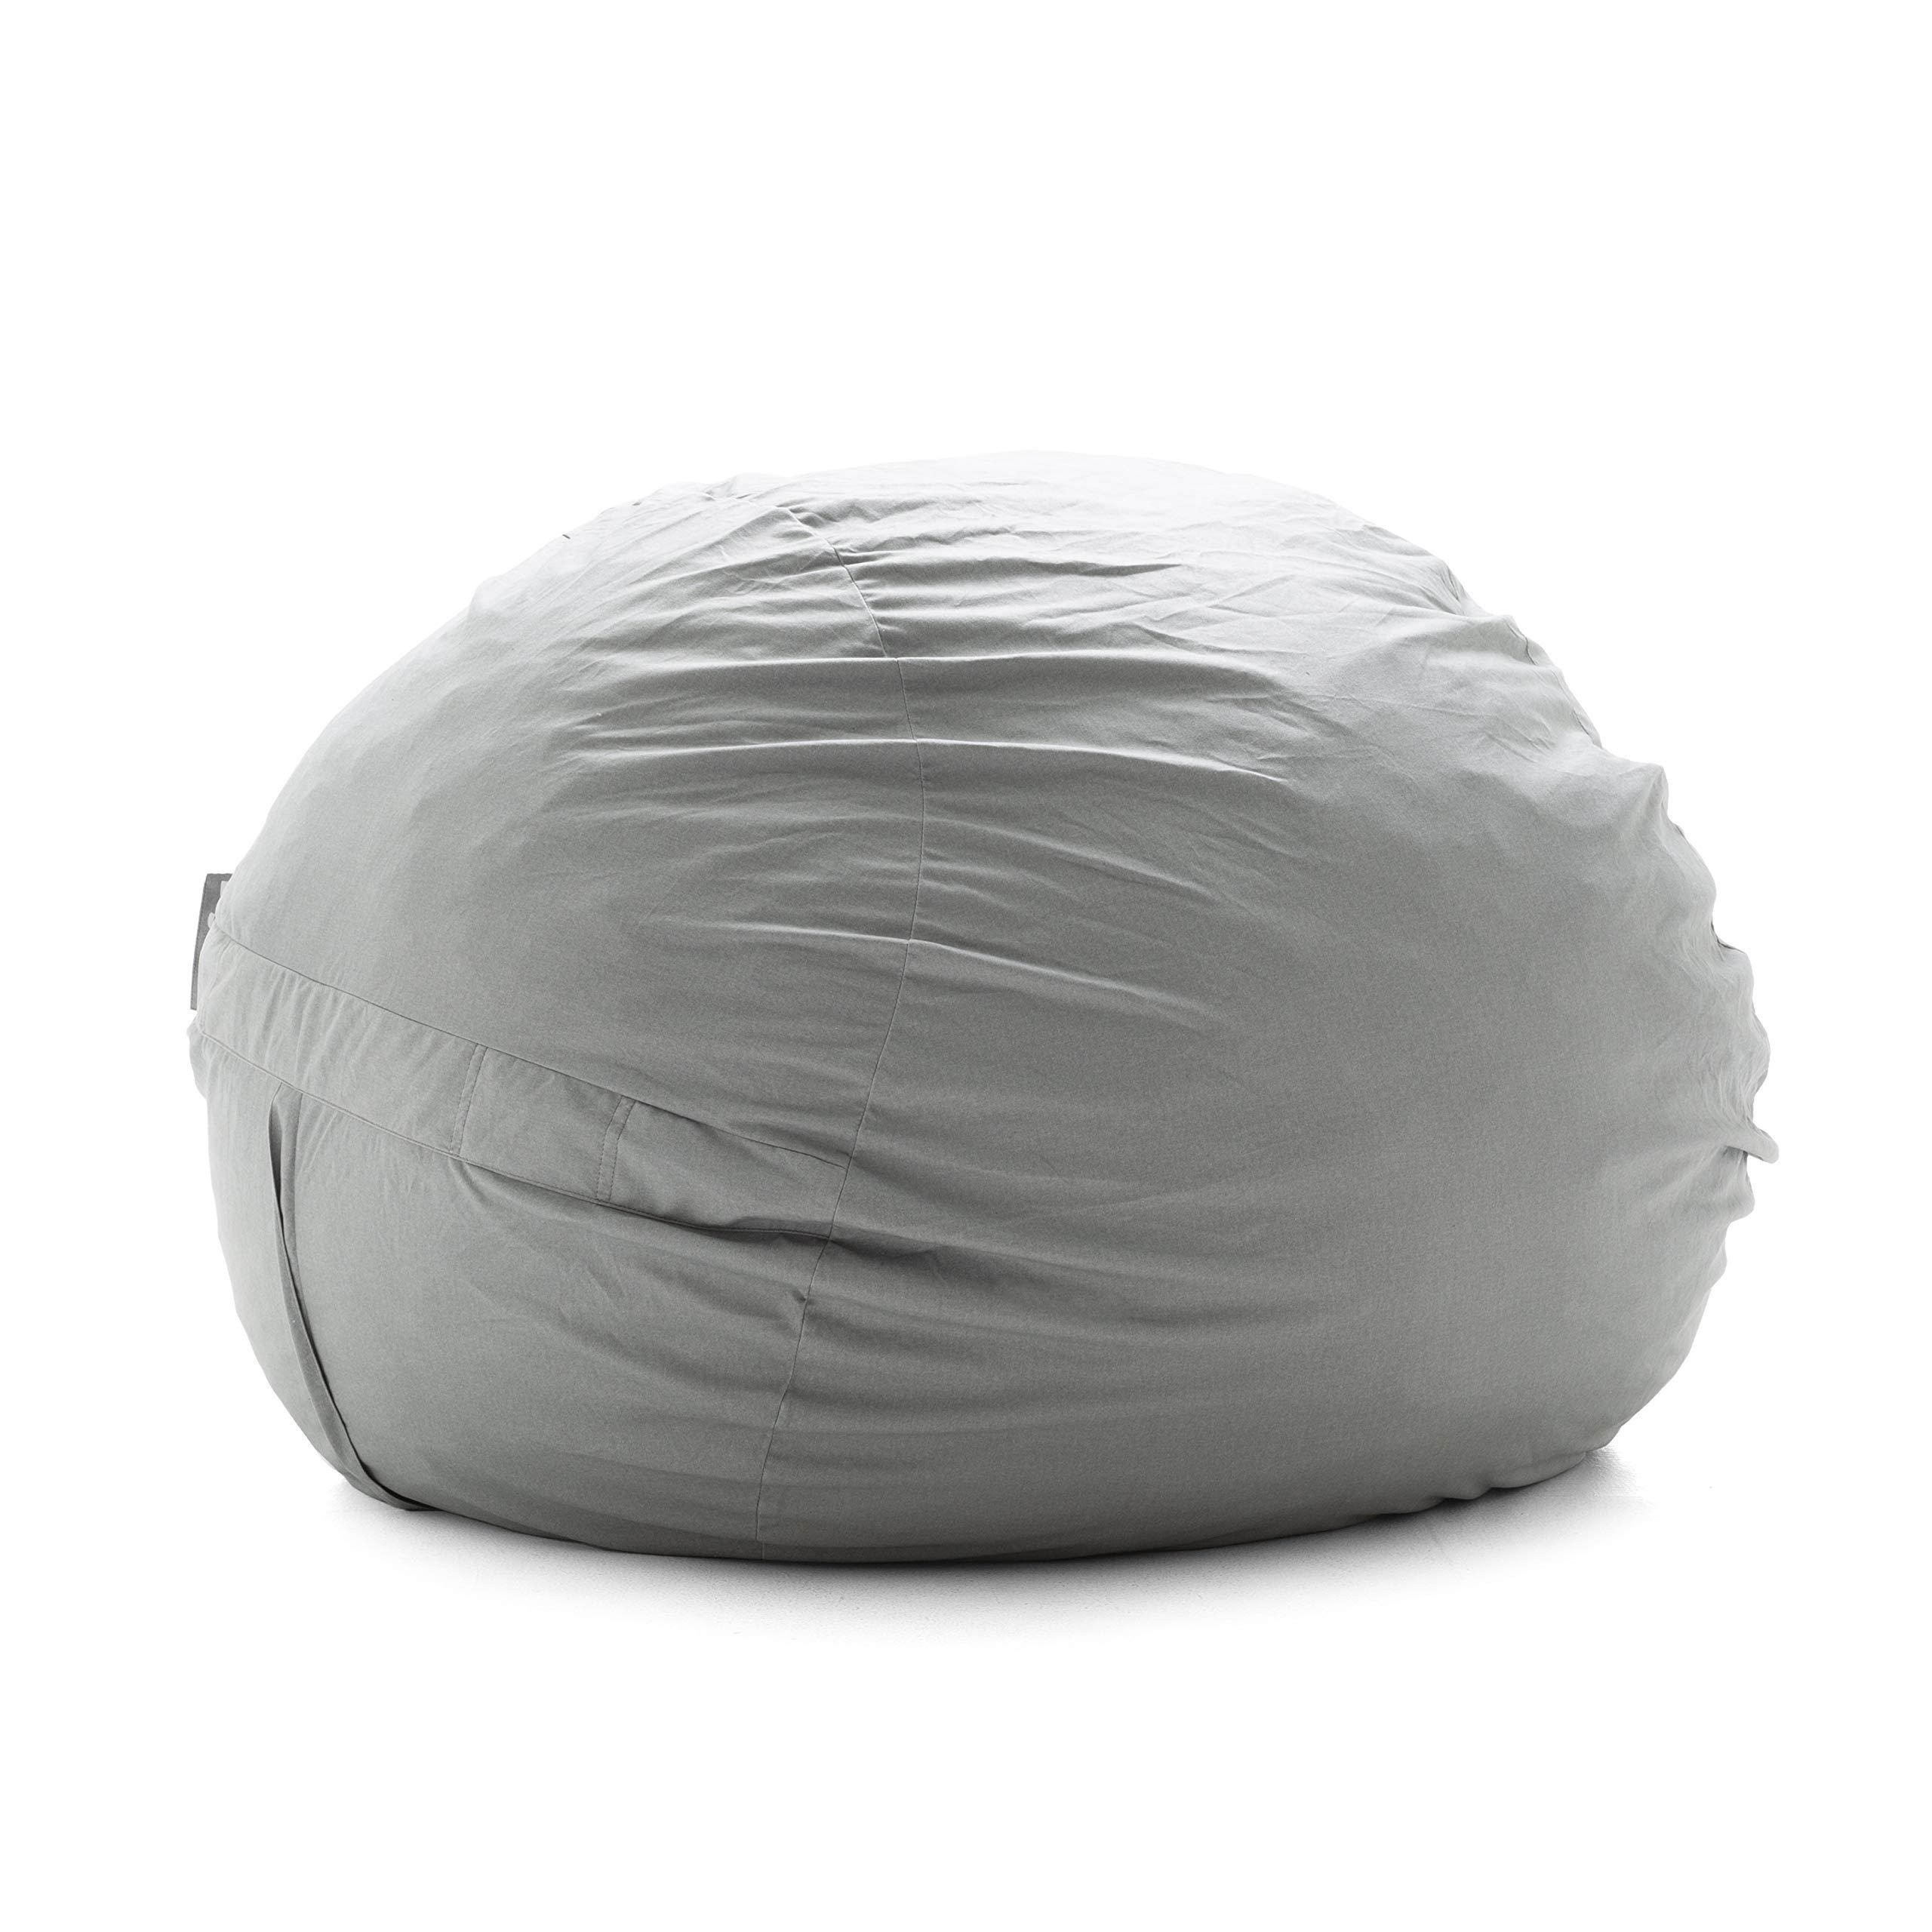 Big Joe 0006658L Super Fuf with Removeable and Washable Cover, Fog Lenox Shredded Foam Bean Bag Fog Gray Fog Gray